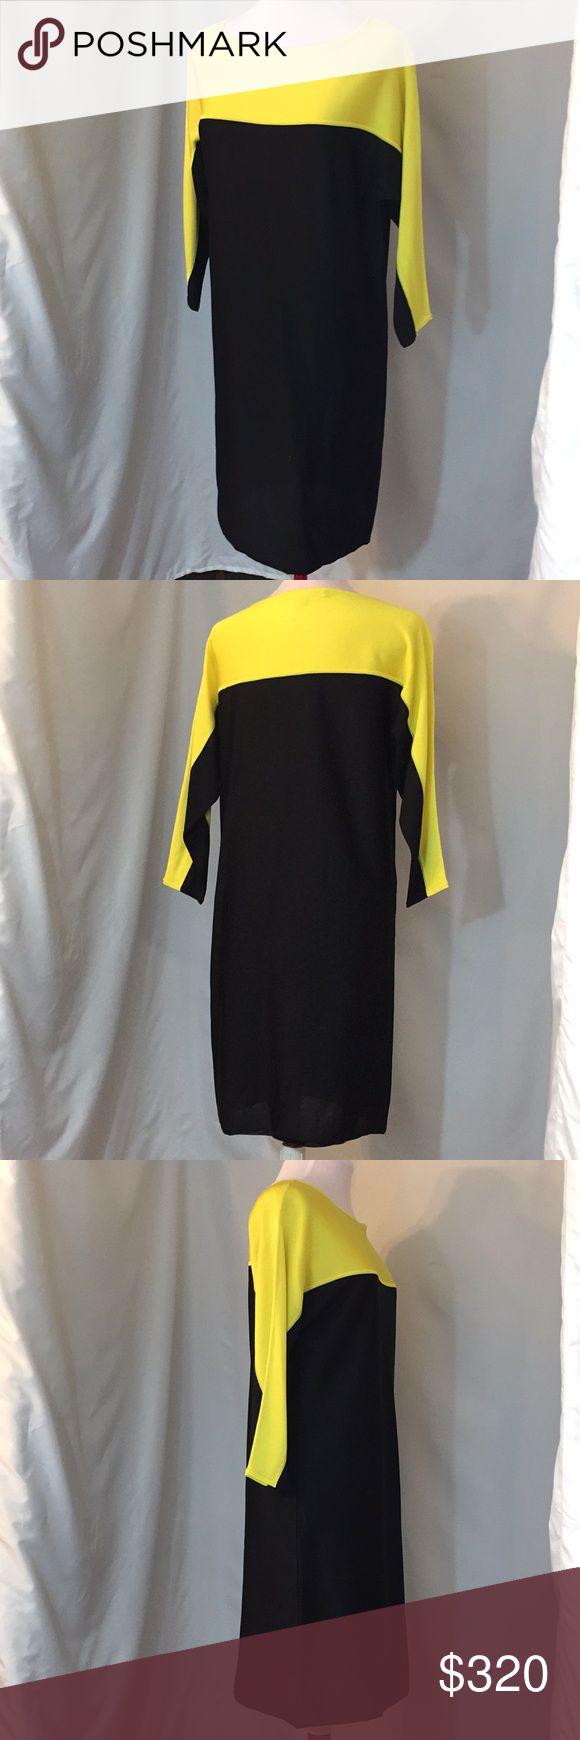 Ralph Lauren Dress Authentic  Ralph Lauren Size M Originally $1000 Excellent condition  Black, yellow, dress  **CA200 Ralph Lauren Dresses Midi